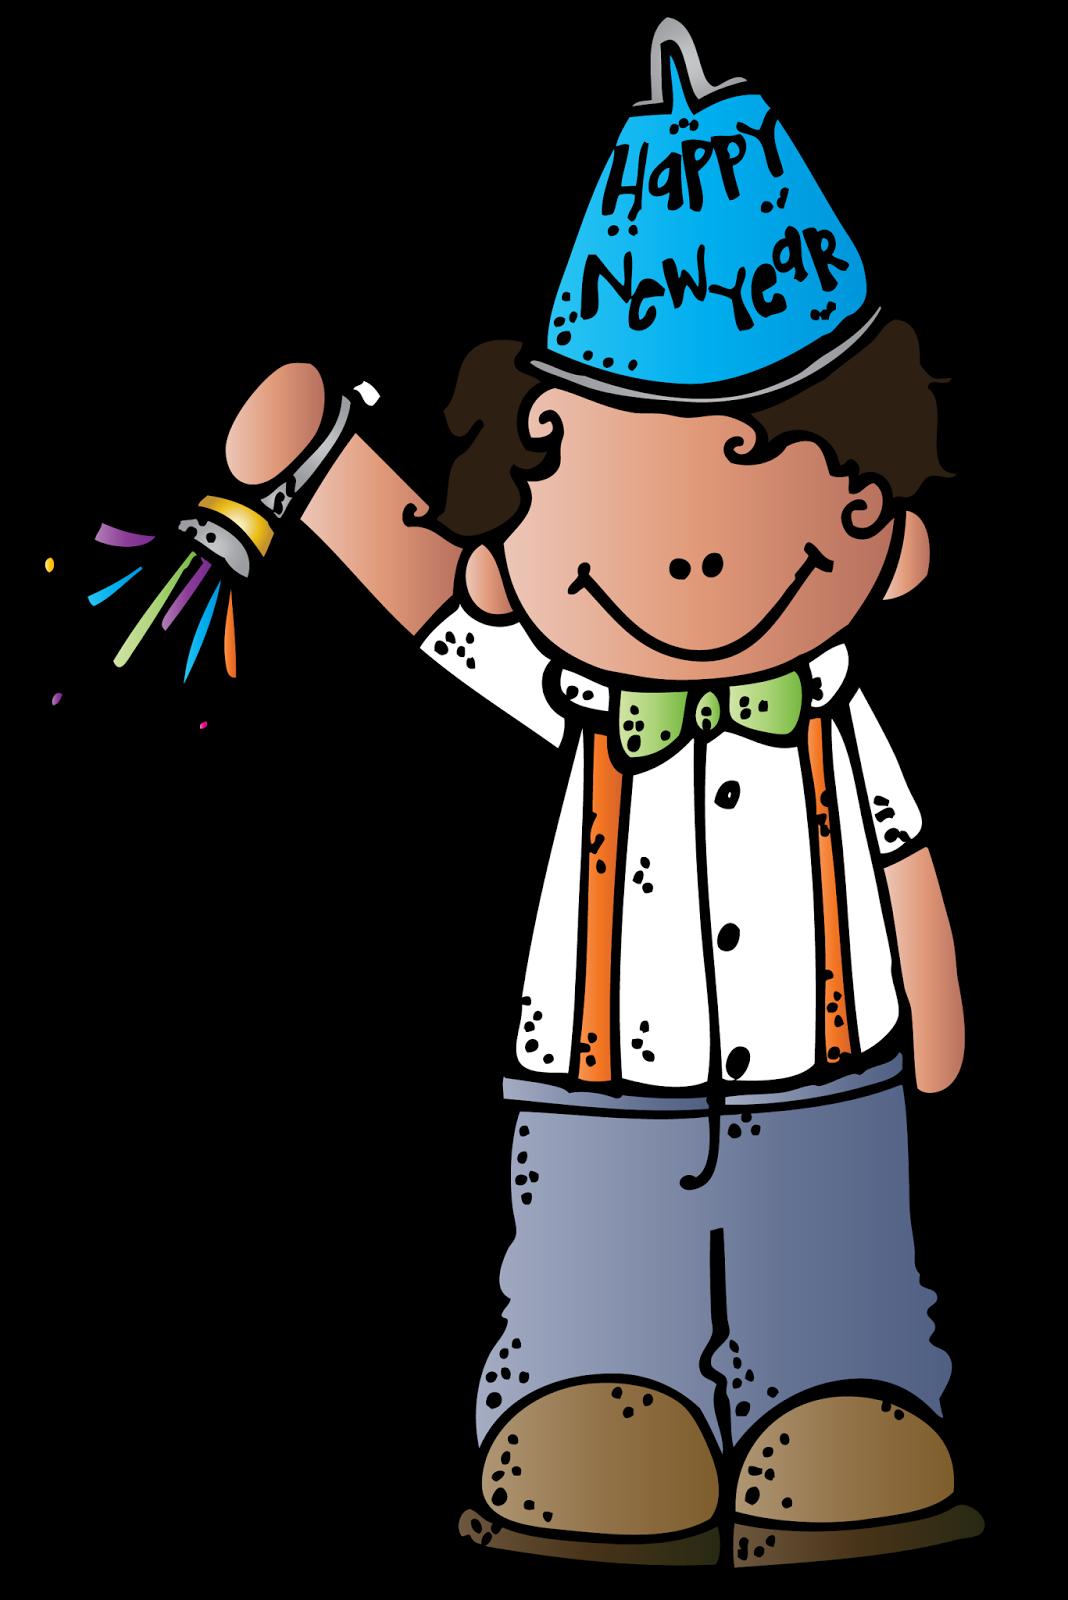 Melonheadz star wars dress up clipart graphic library MelonHeadz: Happy New Year!!!! graphic library